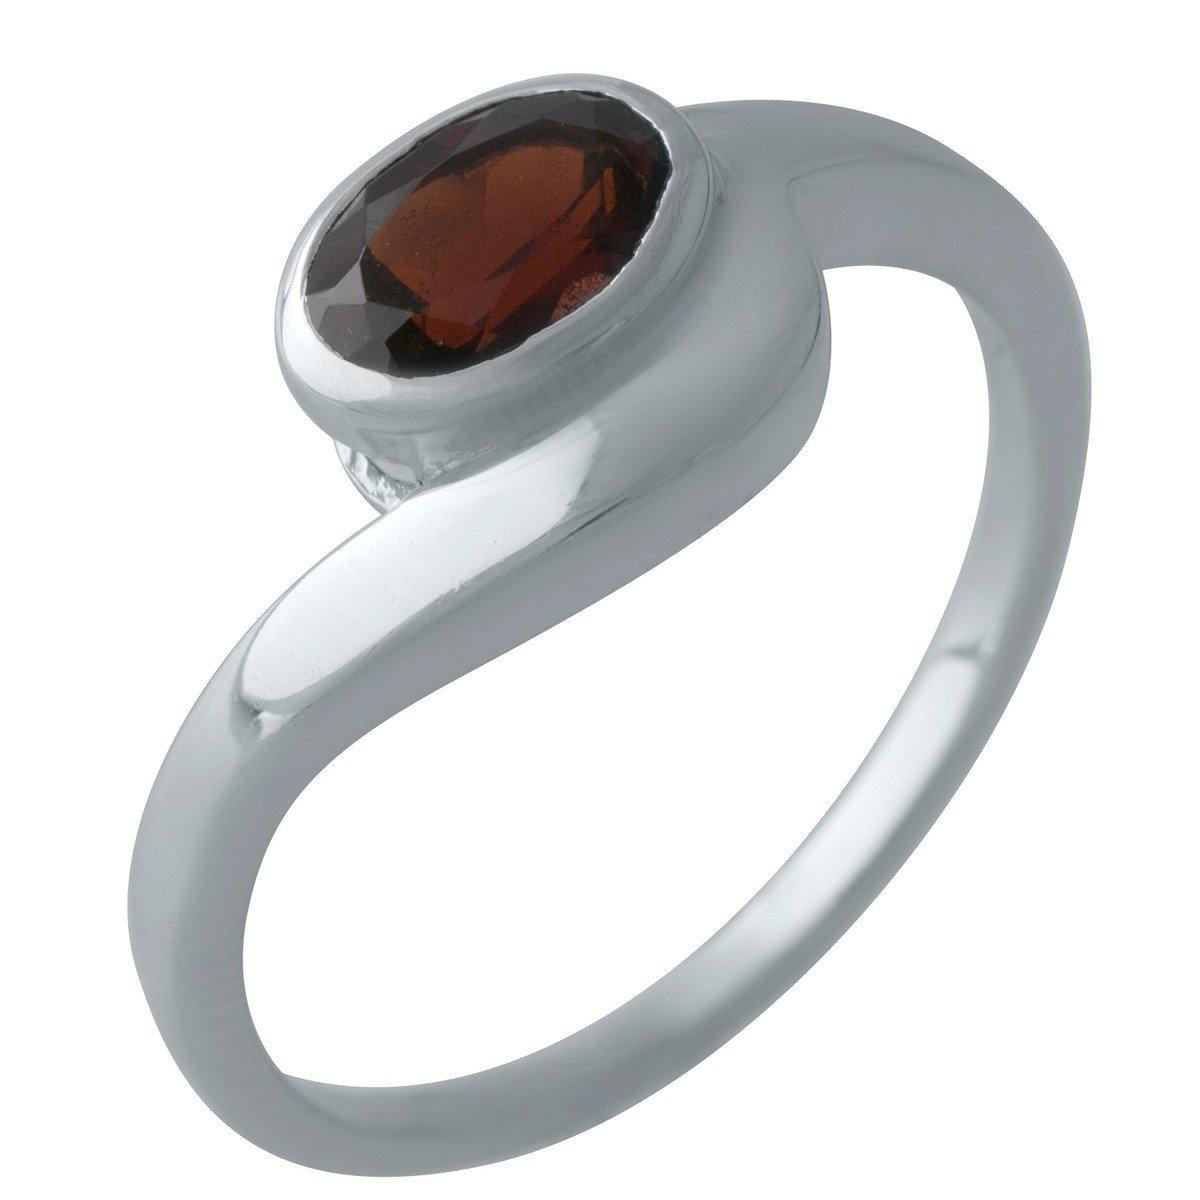 Серебряное кольцо DreamJewelry с натуральным гранатом (2002901) 18 размер